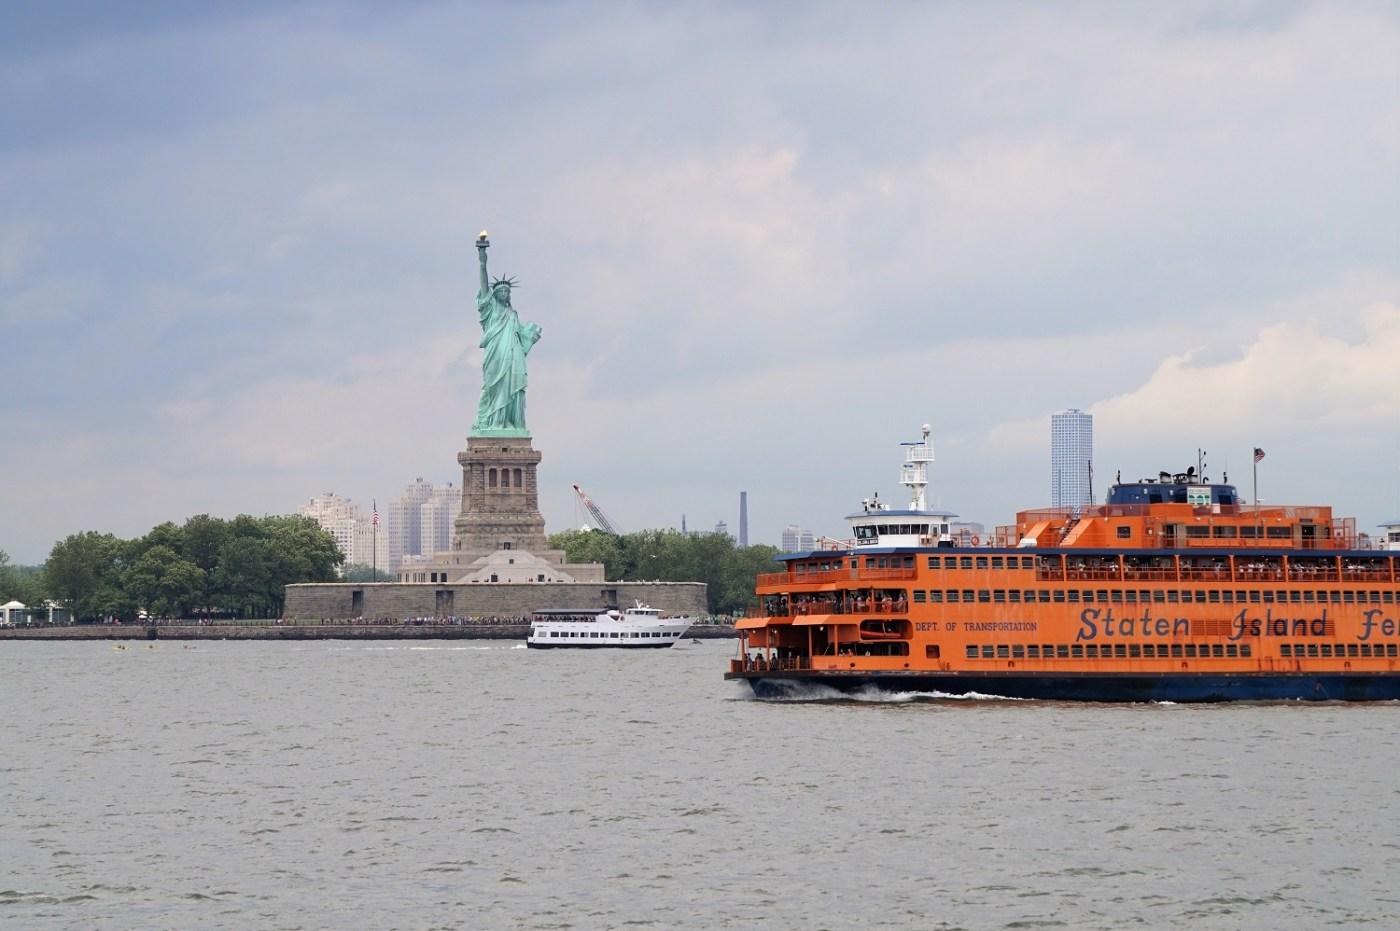 NYCTT Portfolio: the Staten Island Ferry